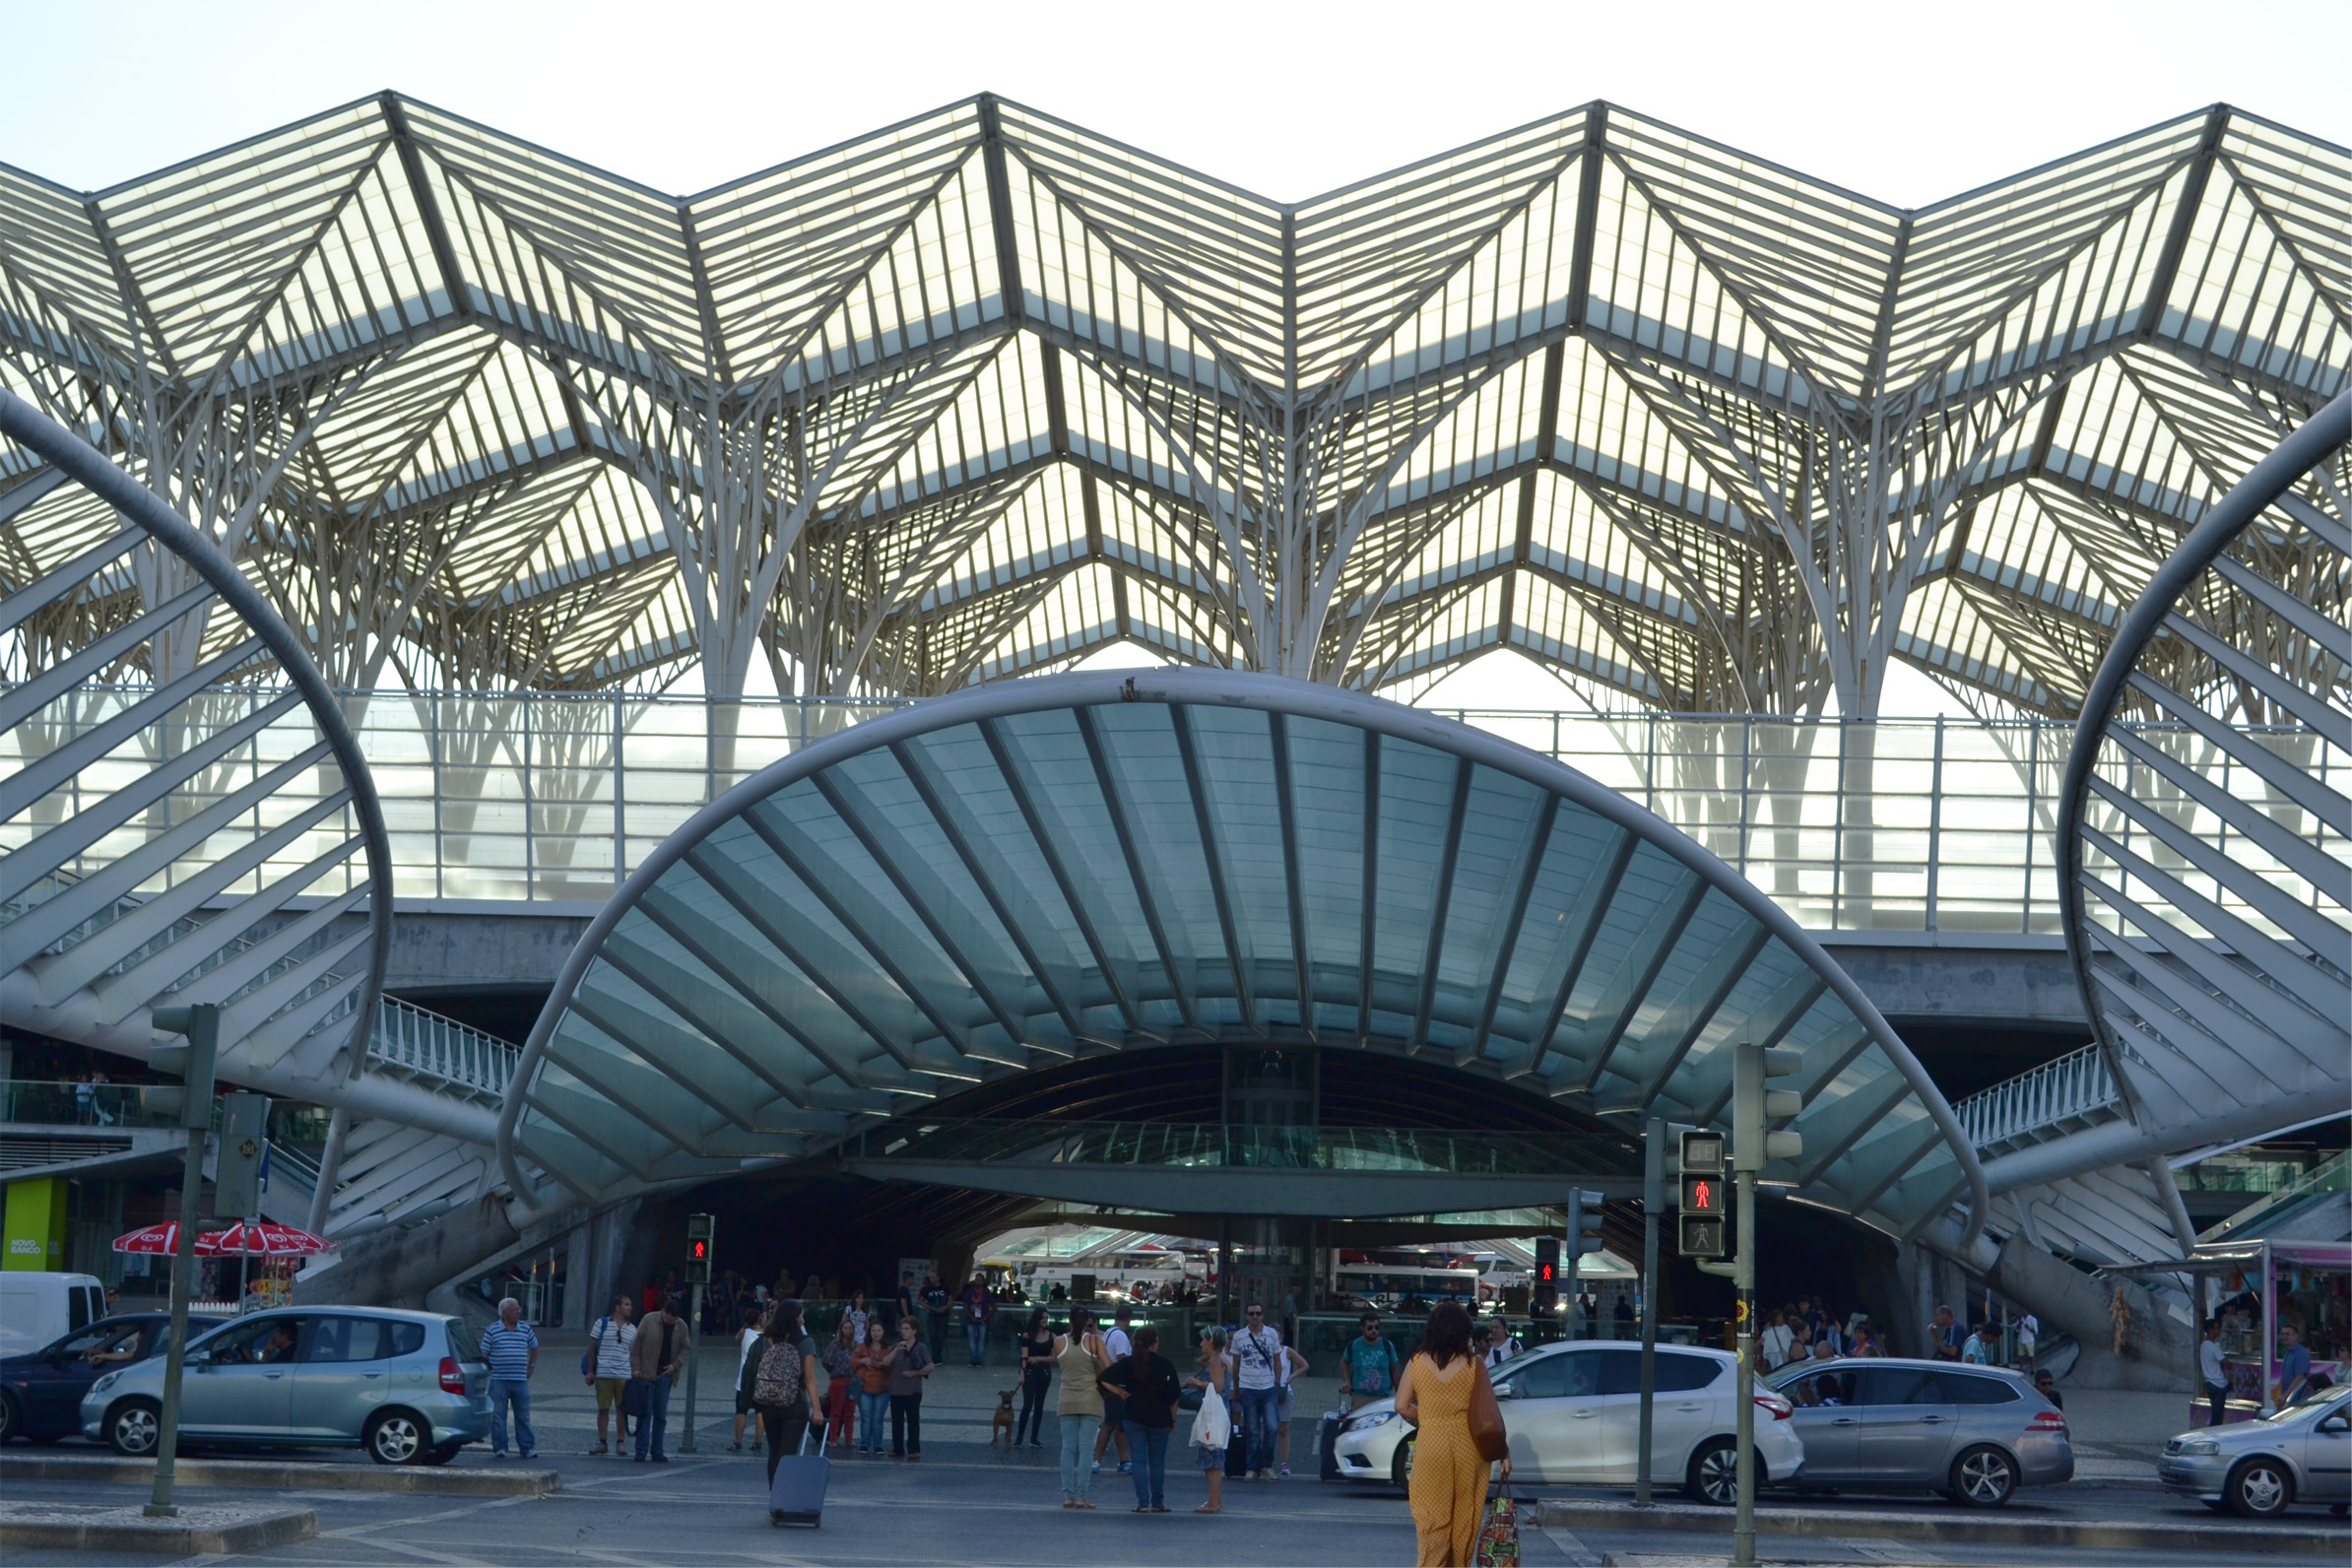 Gare de Lisbonne/Santiago Calatrava